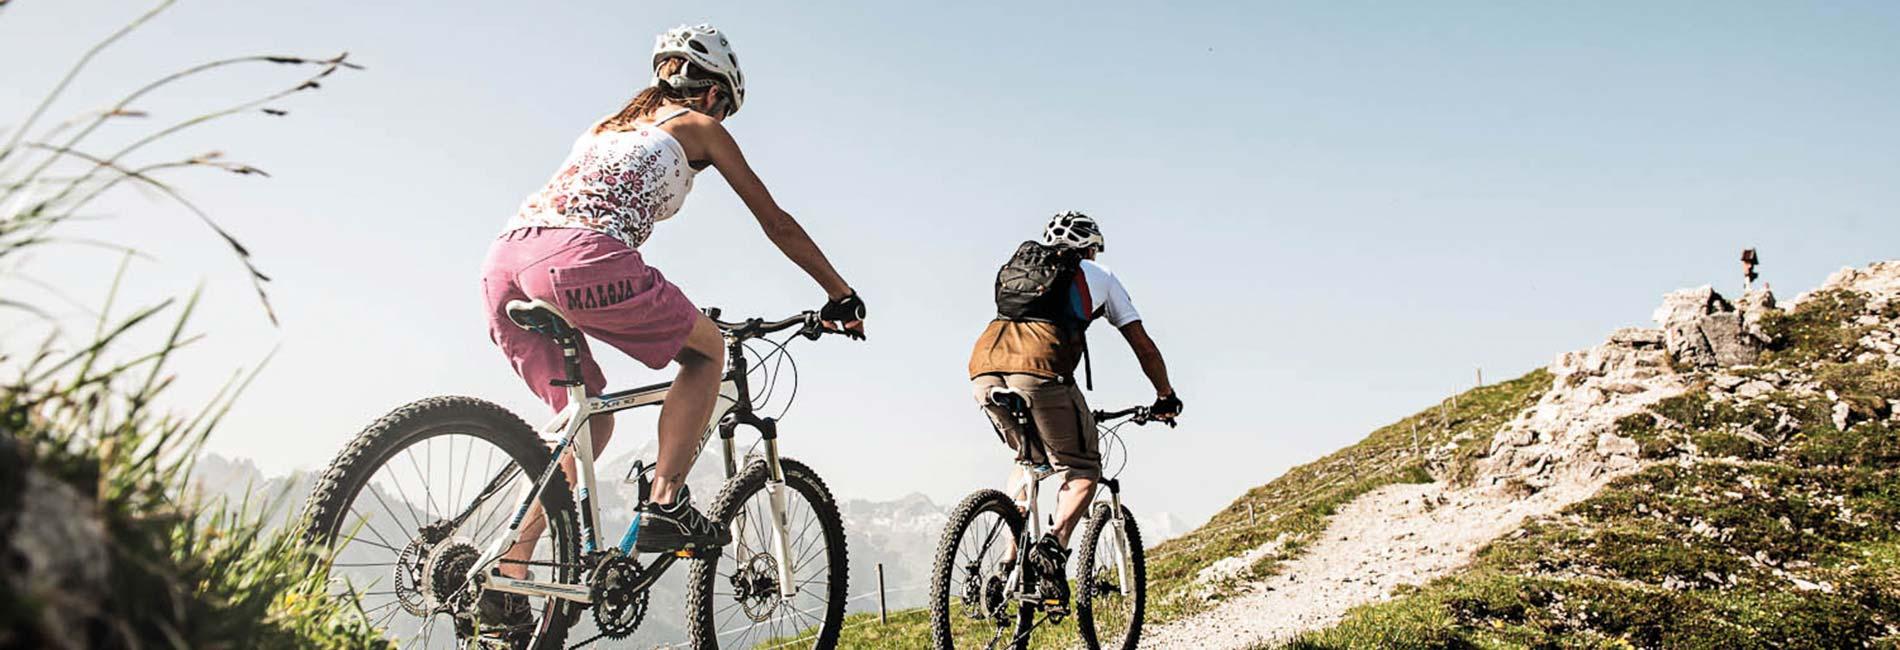 Sommerurlaub im Stubaital Hotel Almhof Neustift Milders Tirol